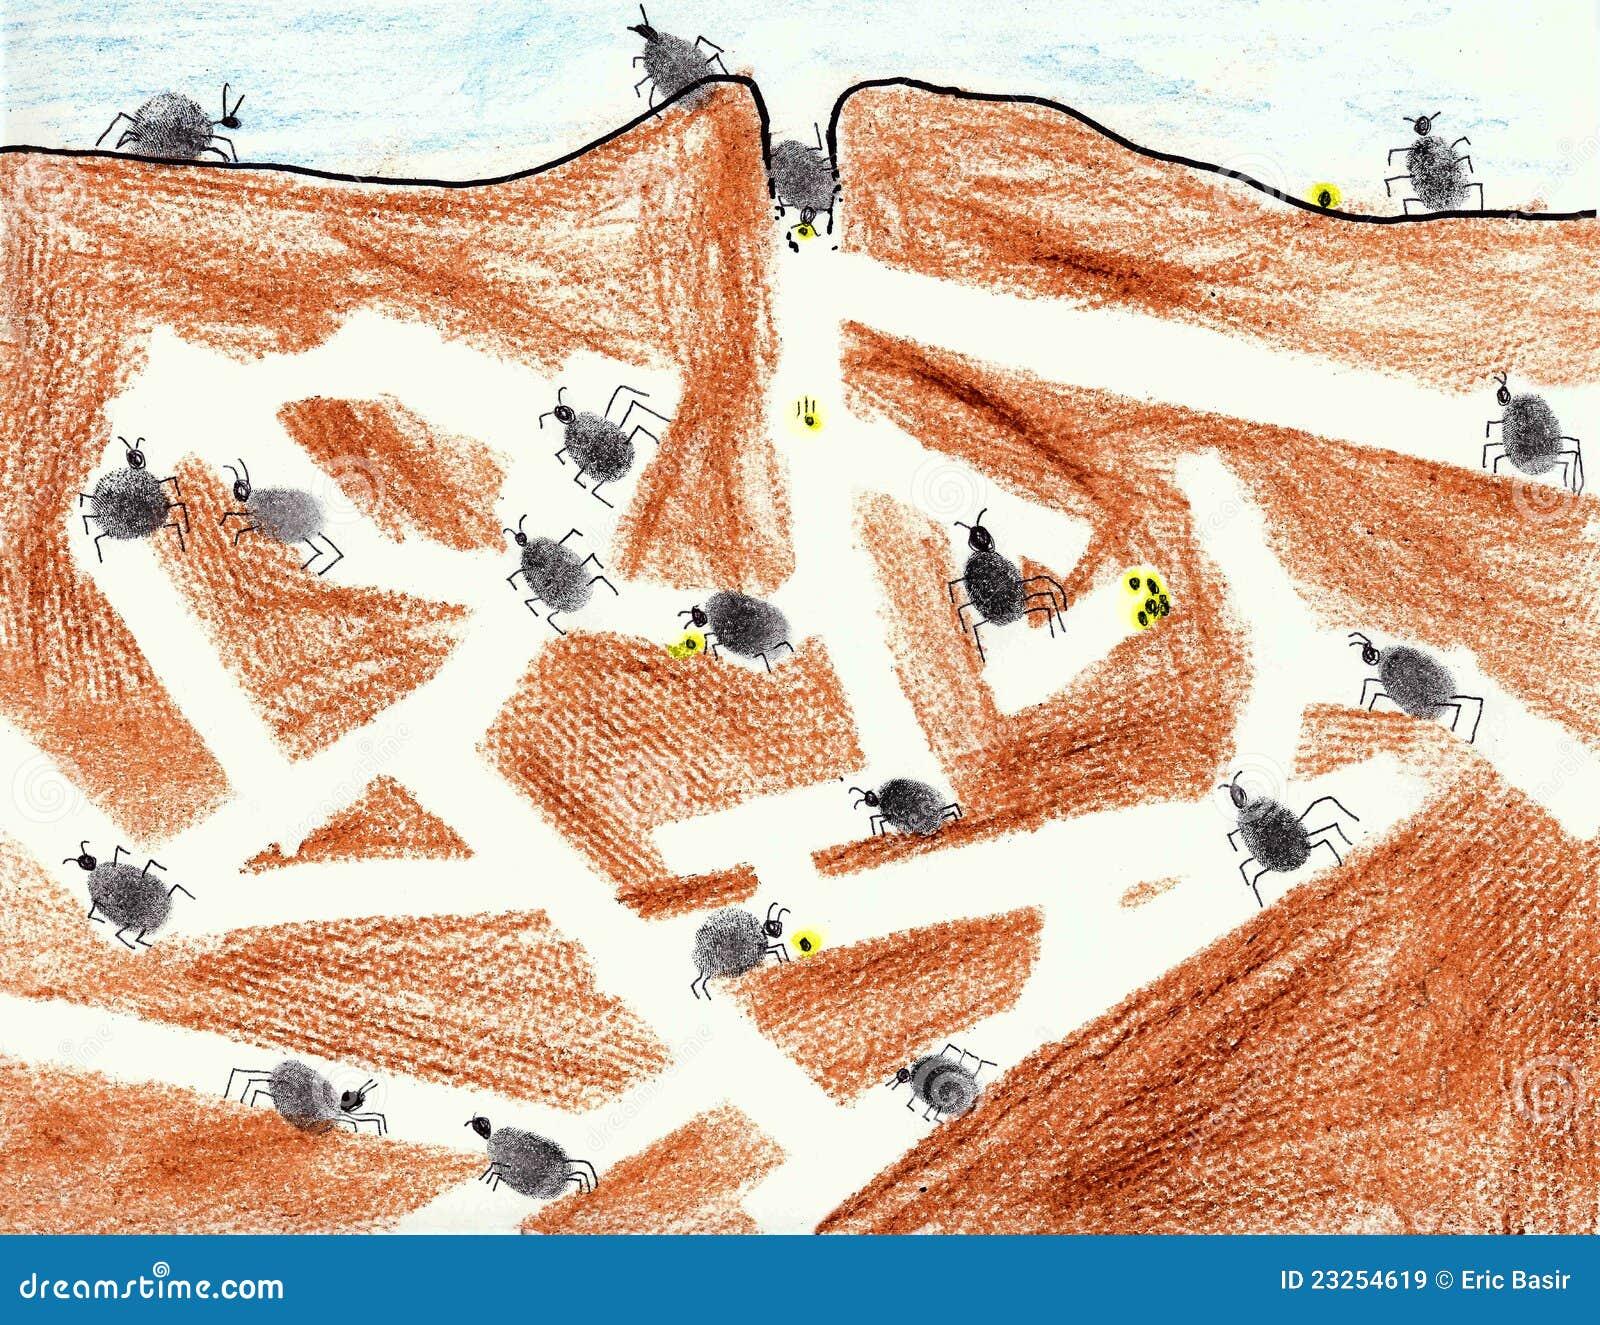 Ant Hill Kids Movie